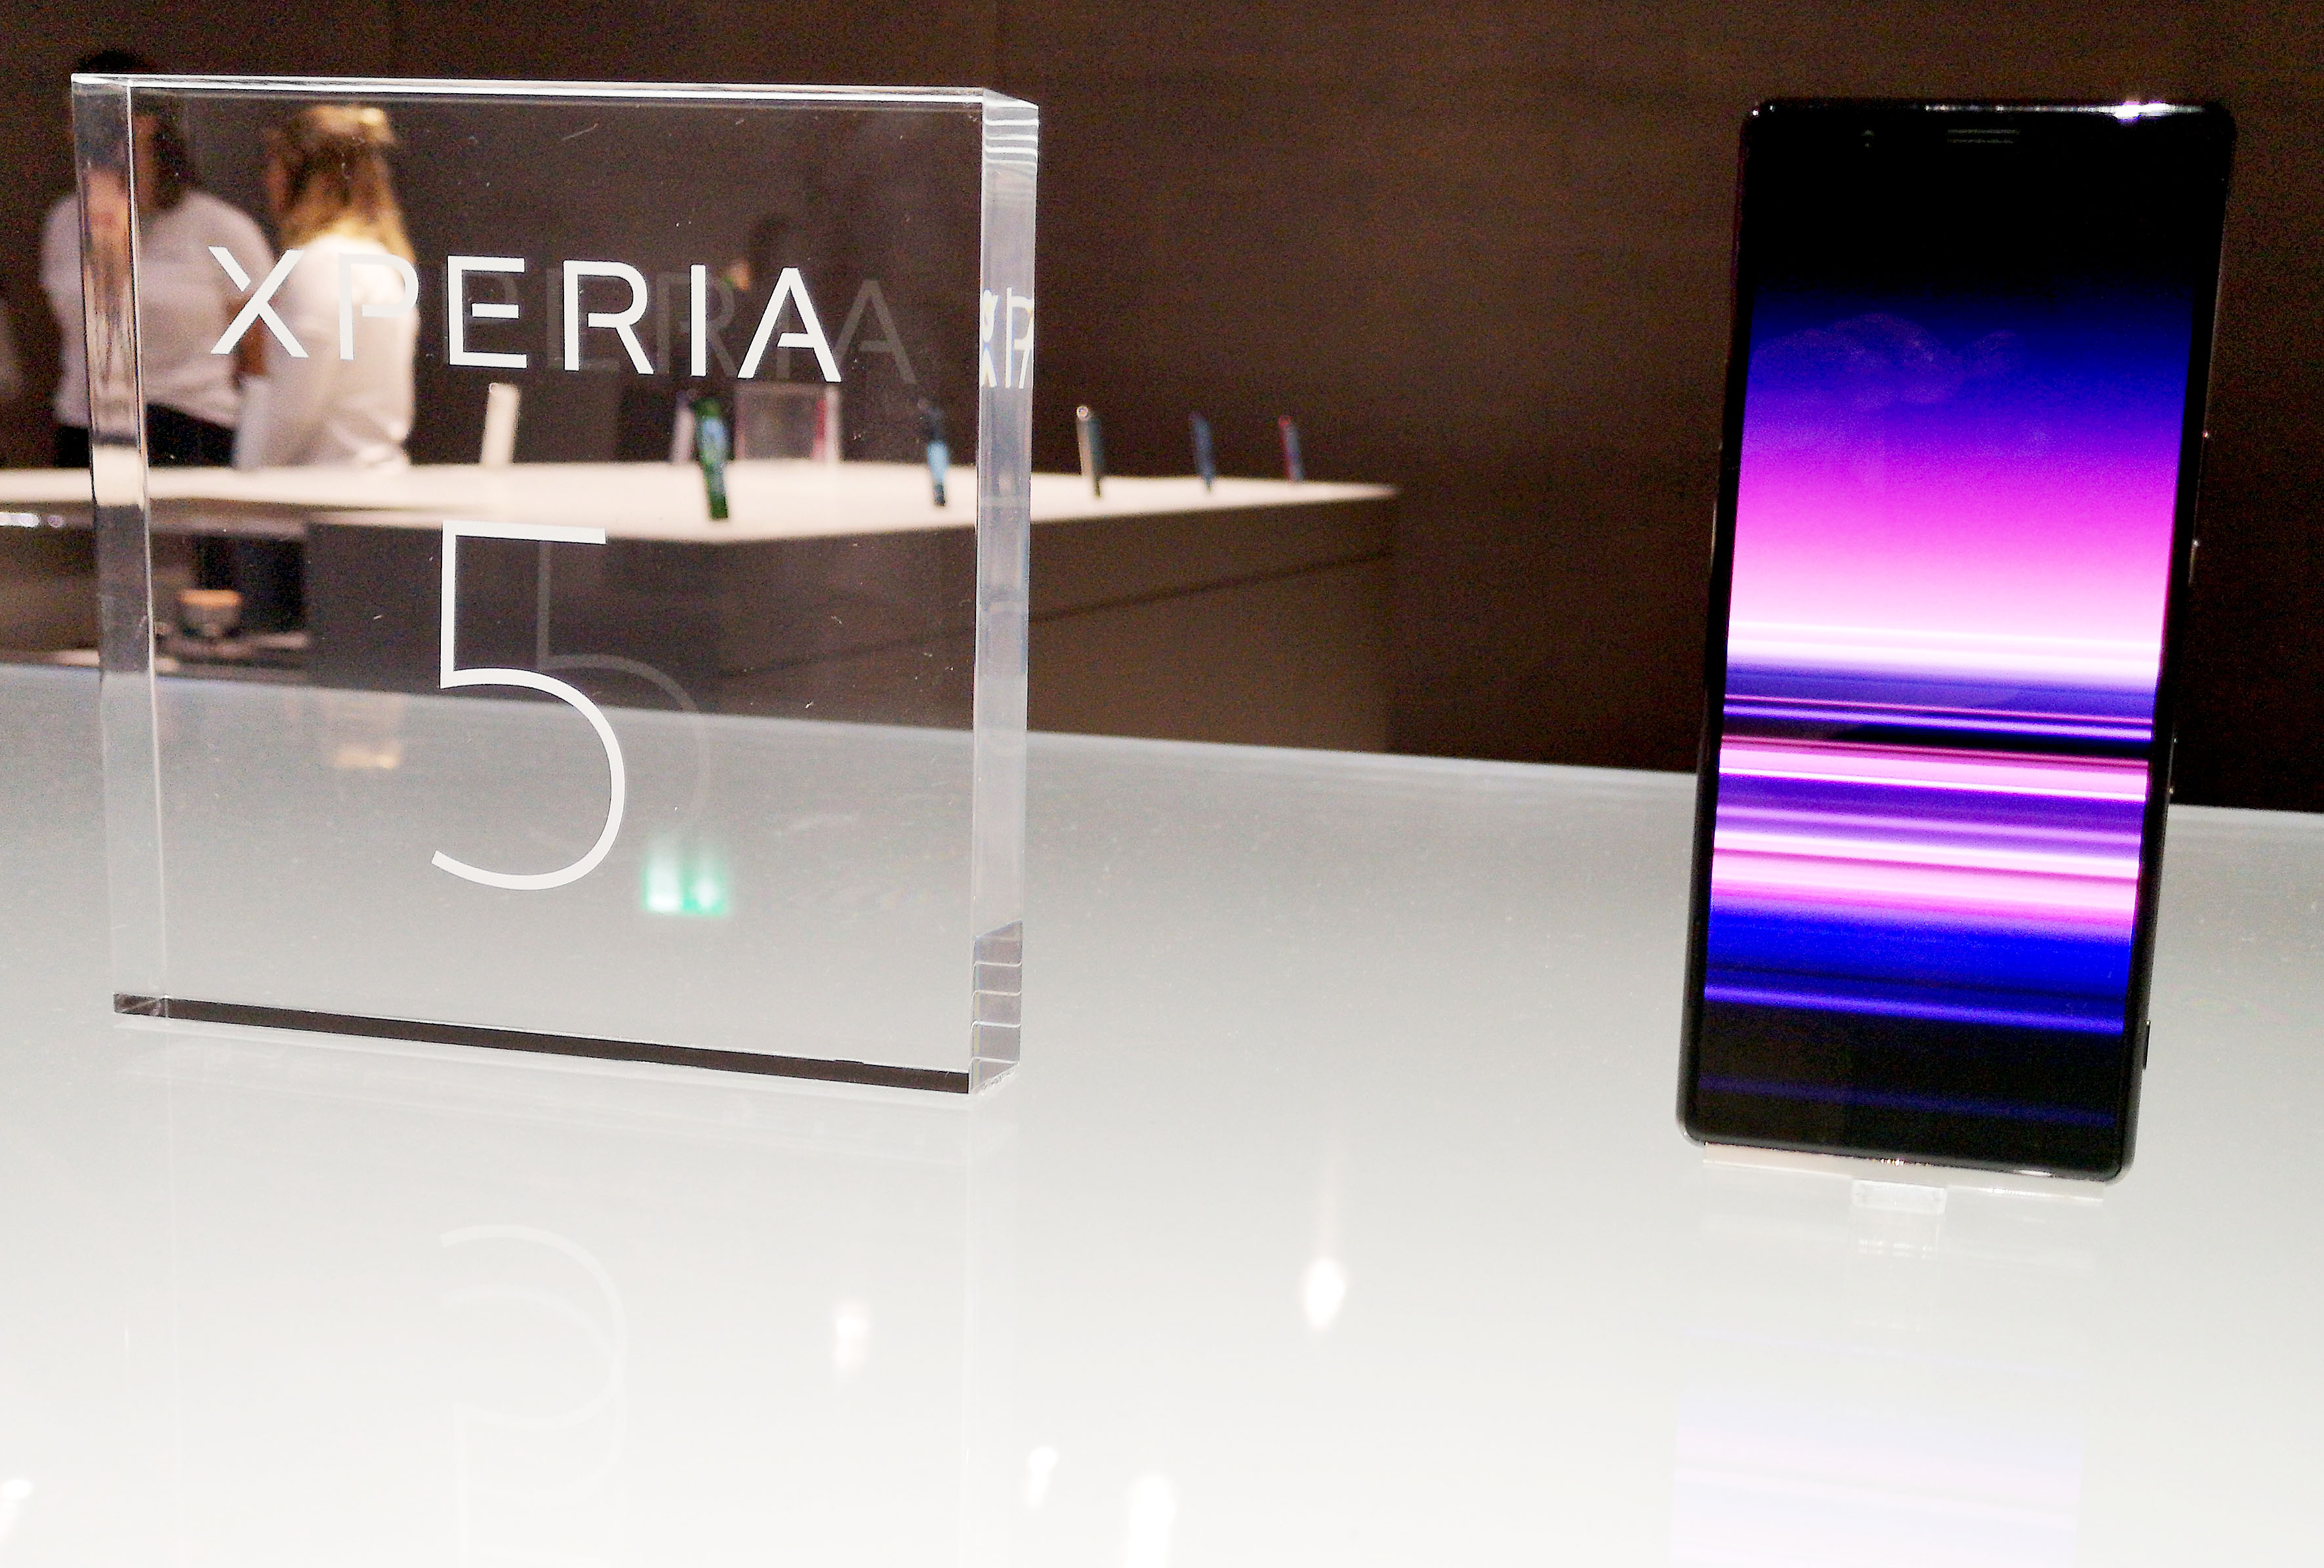 Foto: Michael B. Rehders - Das Sony Xperia ist allgegenwärtig.